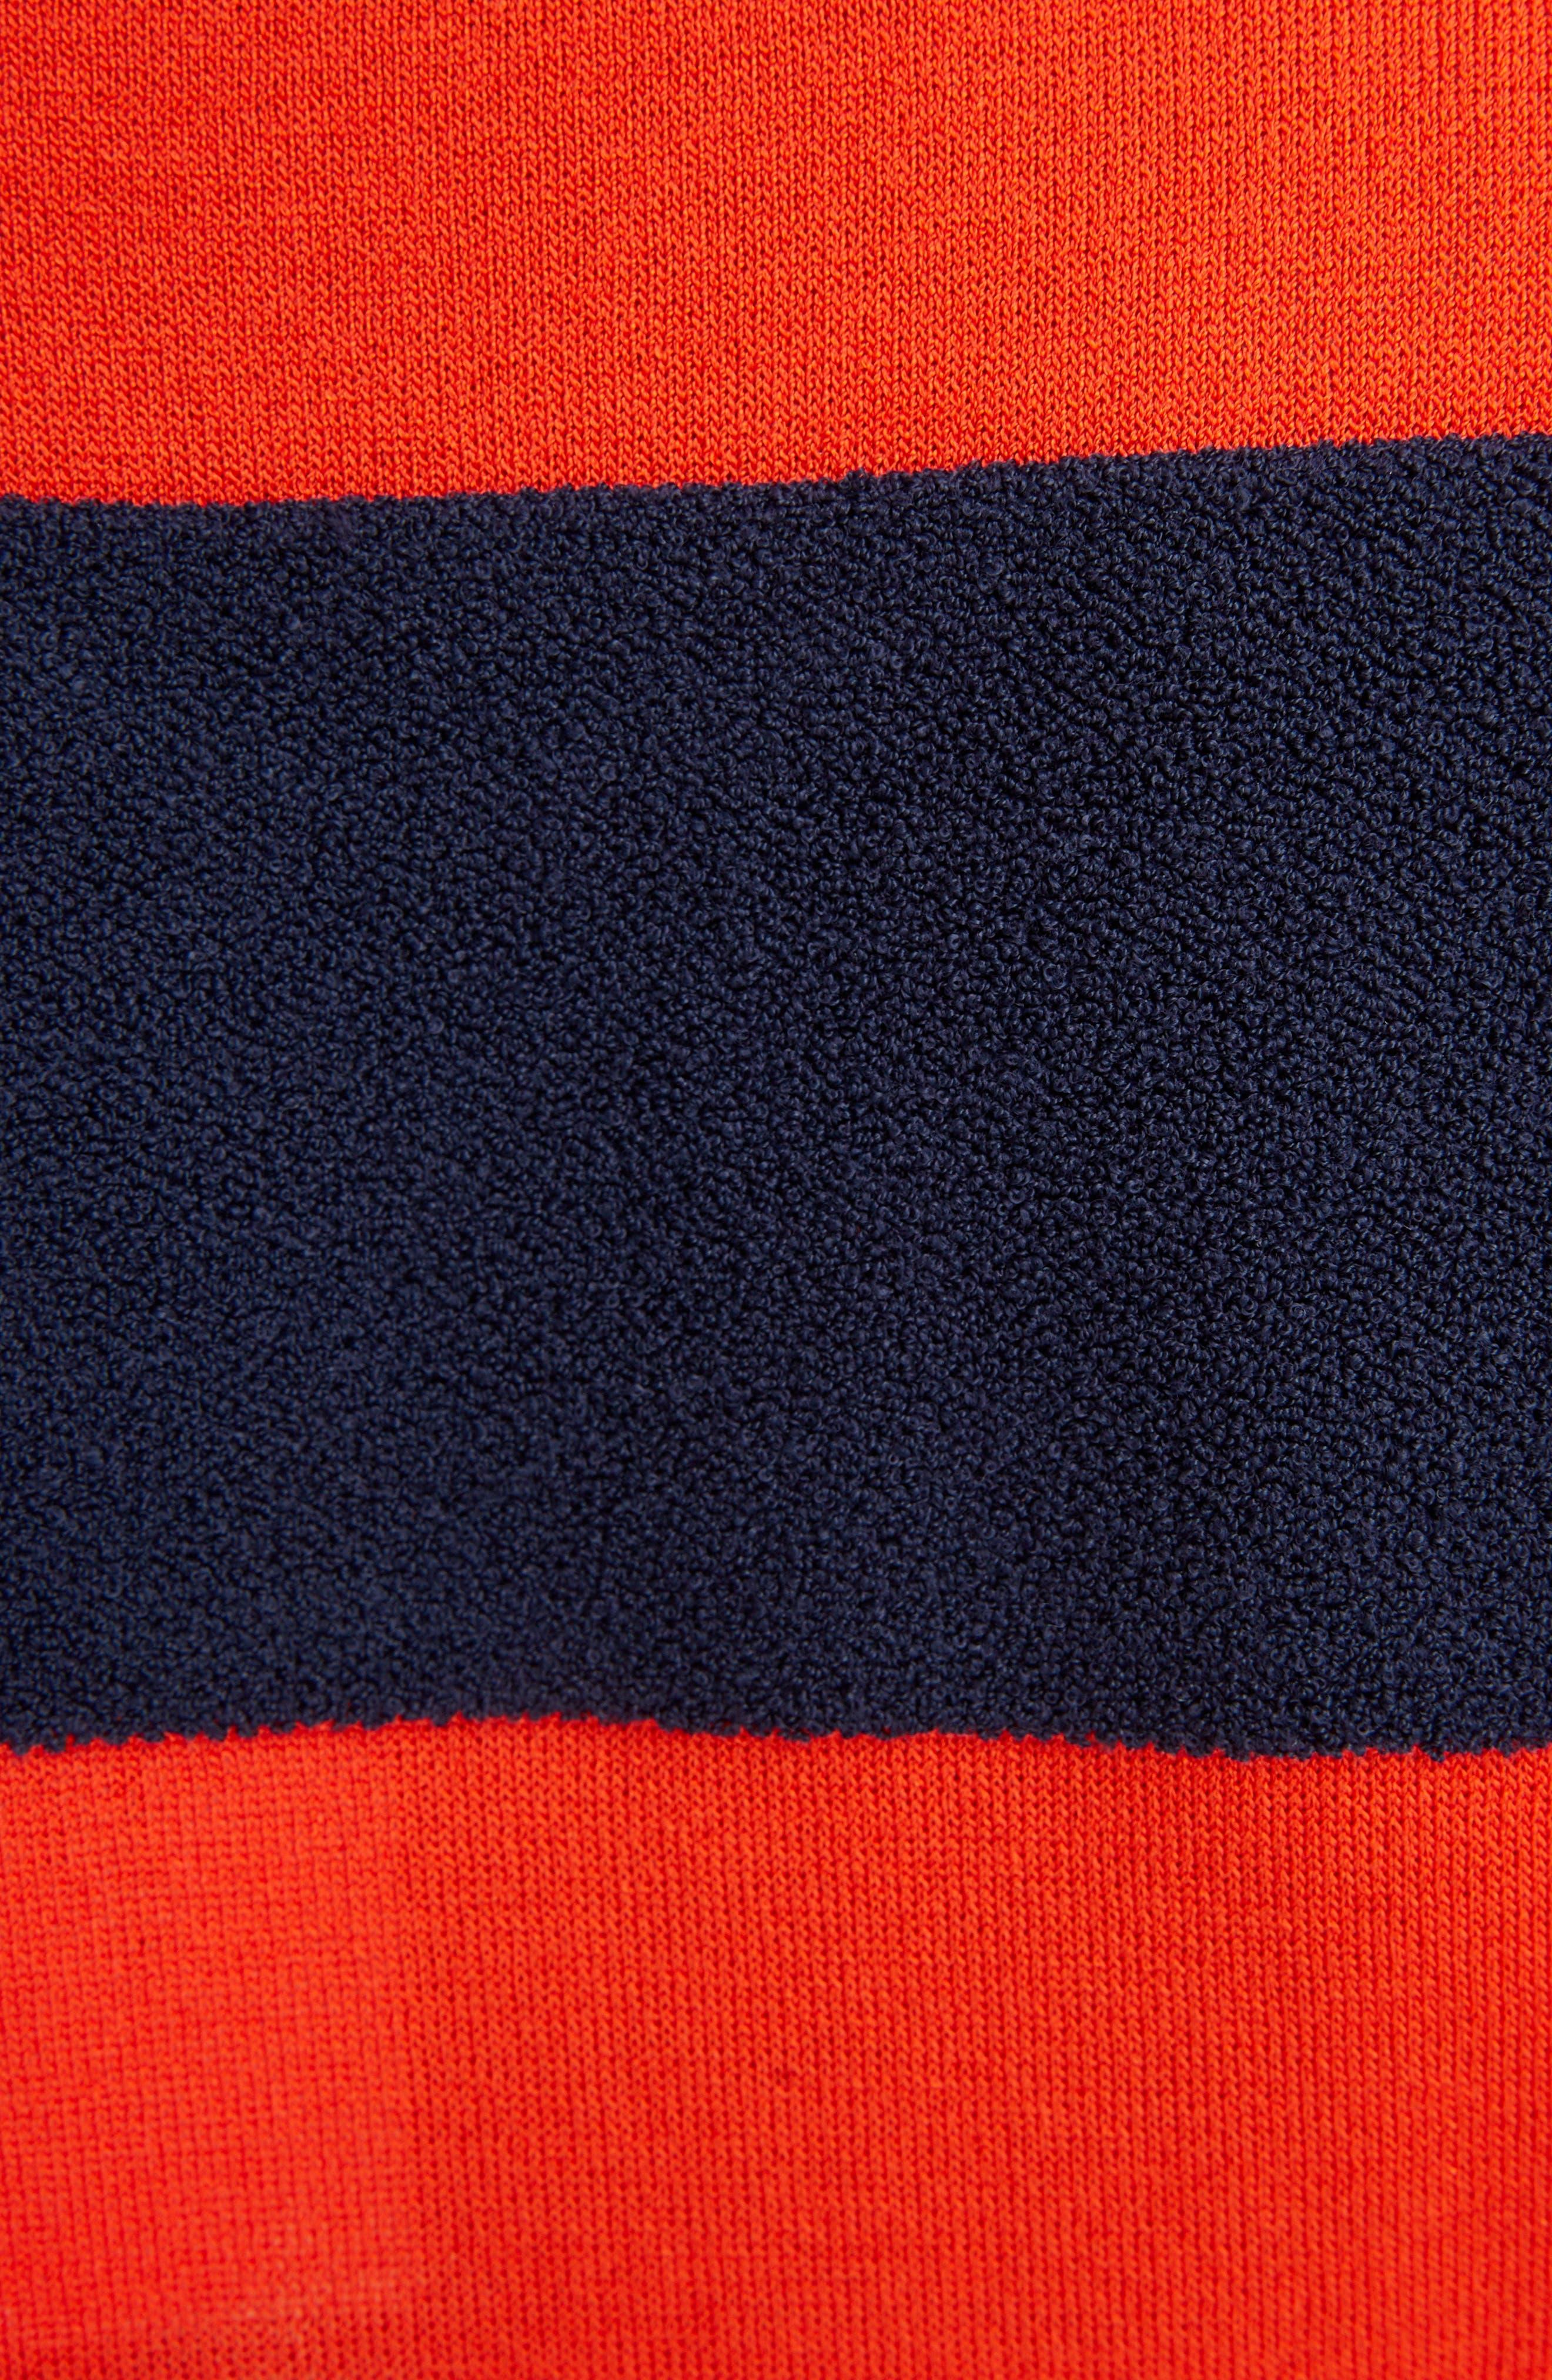 Tassel Detail Rugby Stripe Top,                             Alternate thumbnail 5, color,                             Marine/ Rouge